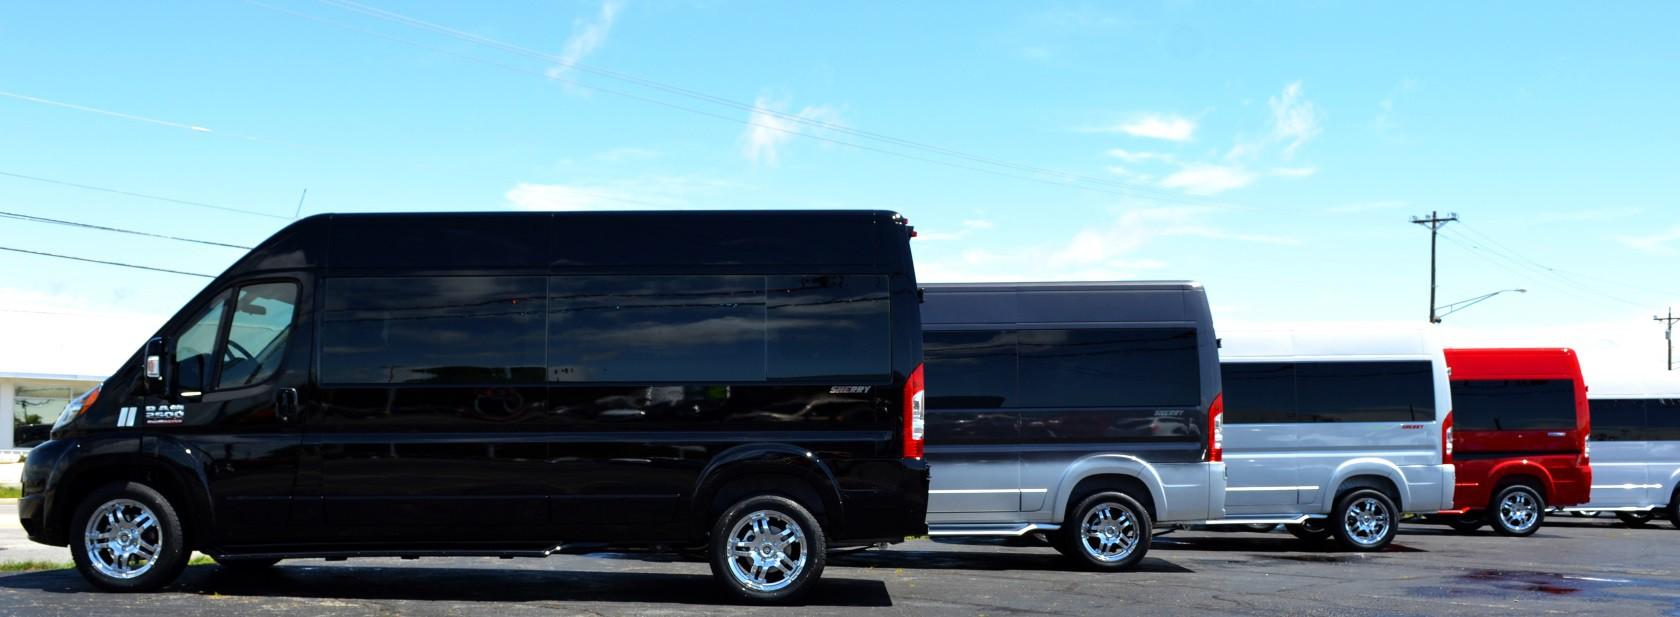 ram vans compare to ford. Black Bedroom Furniture Sets. Home Design Ideas